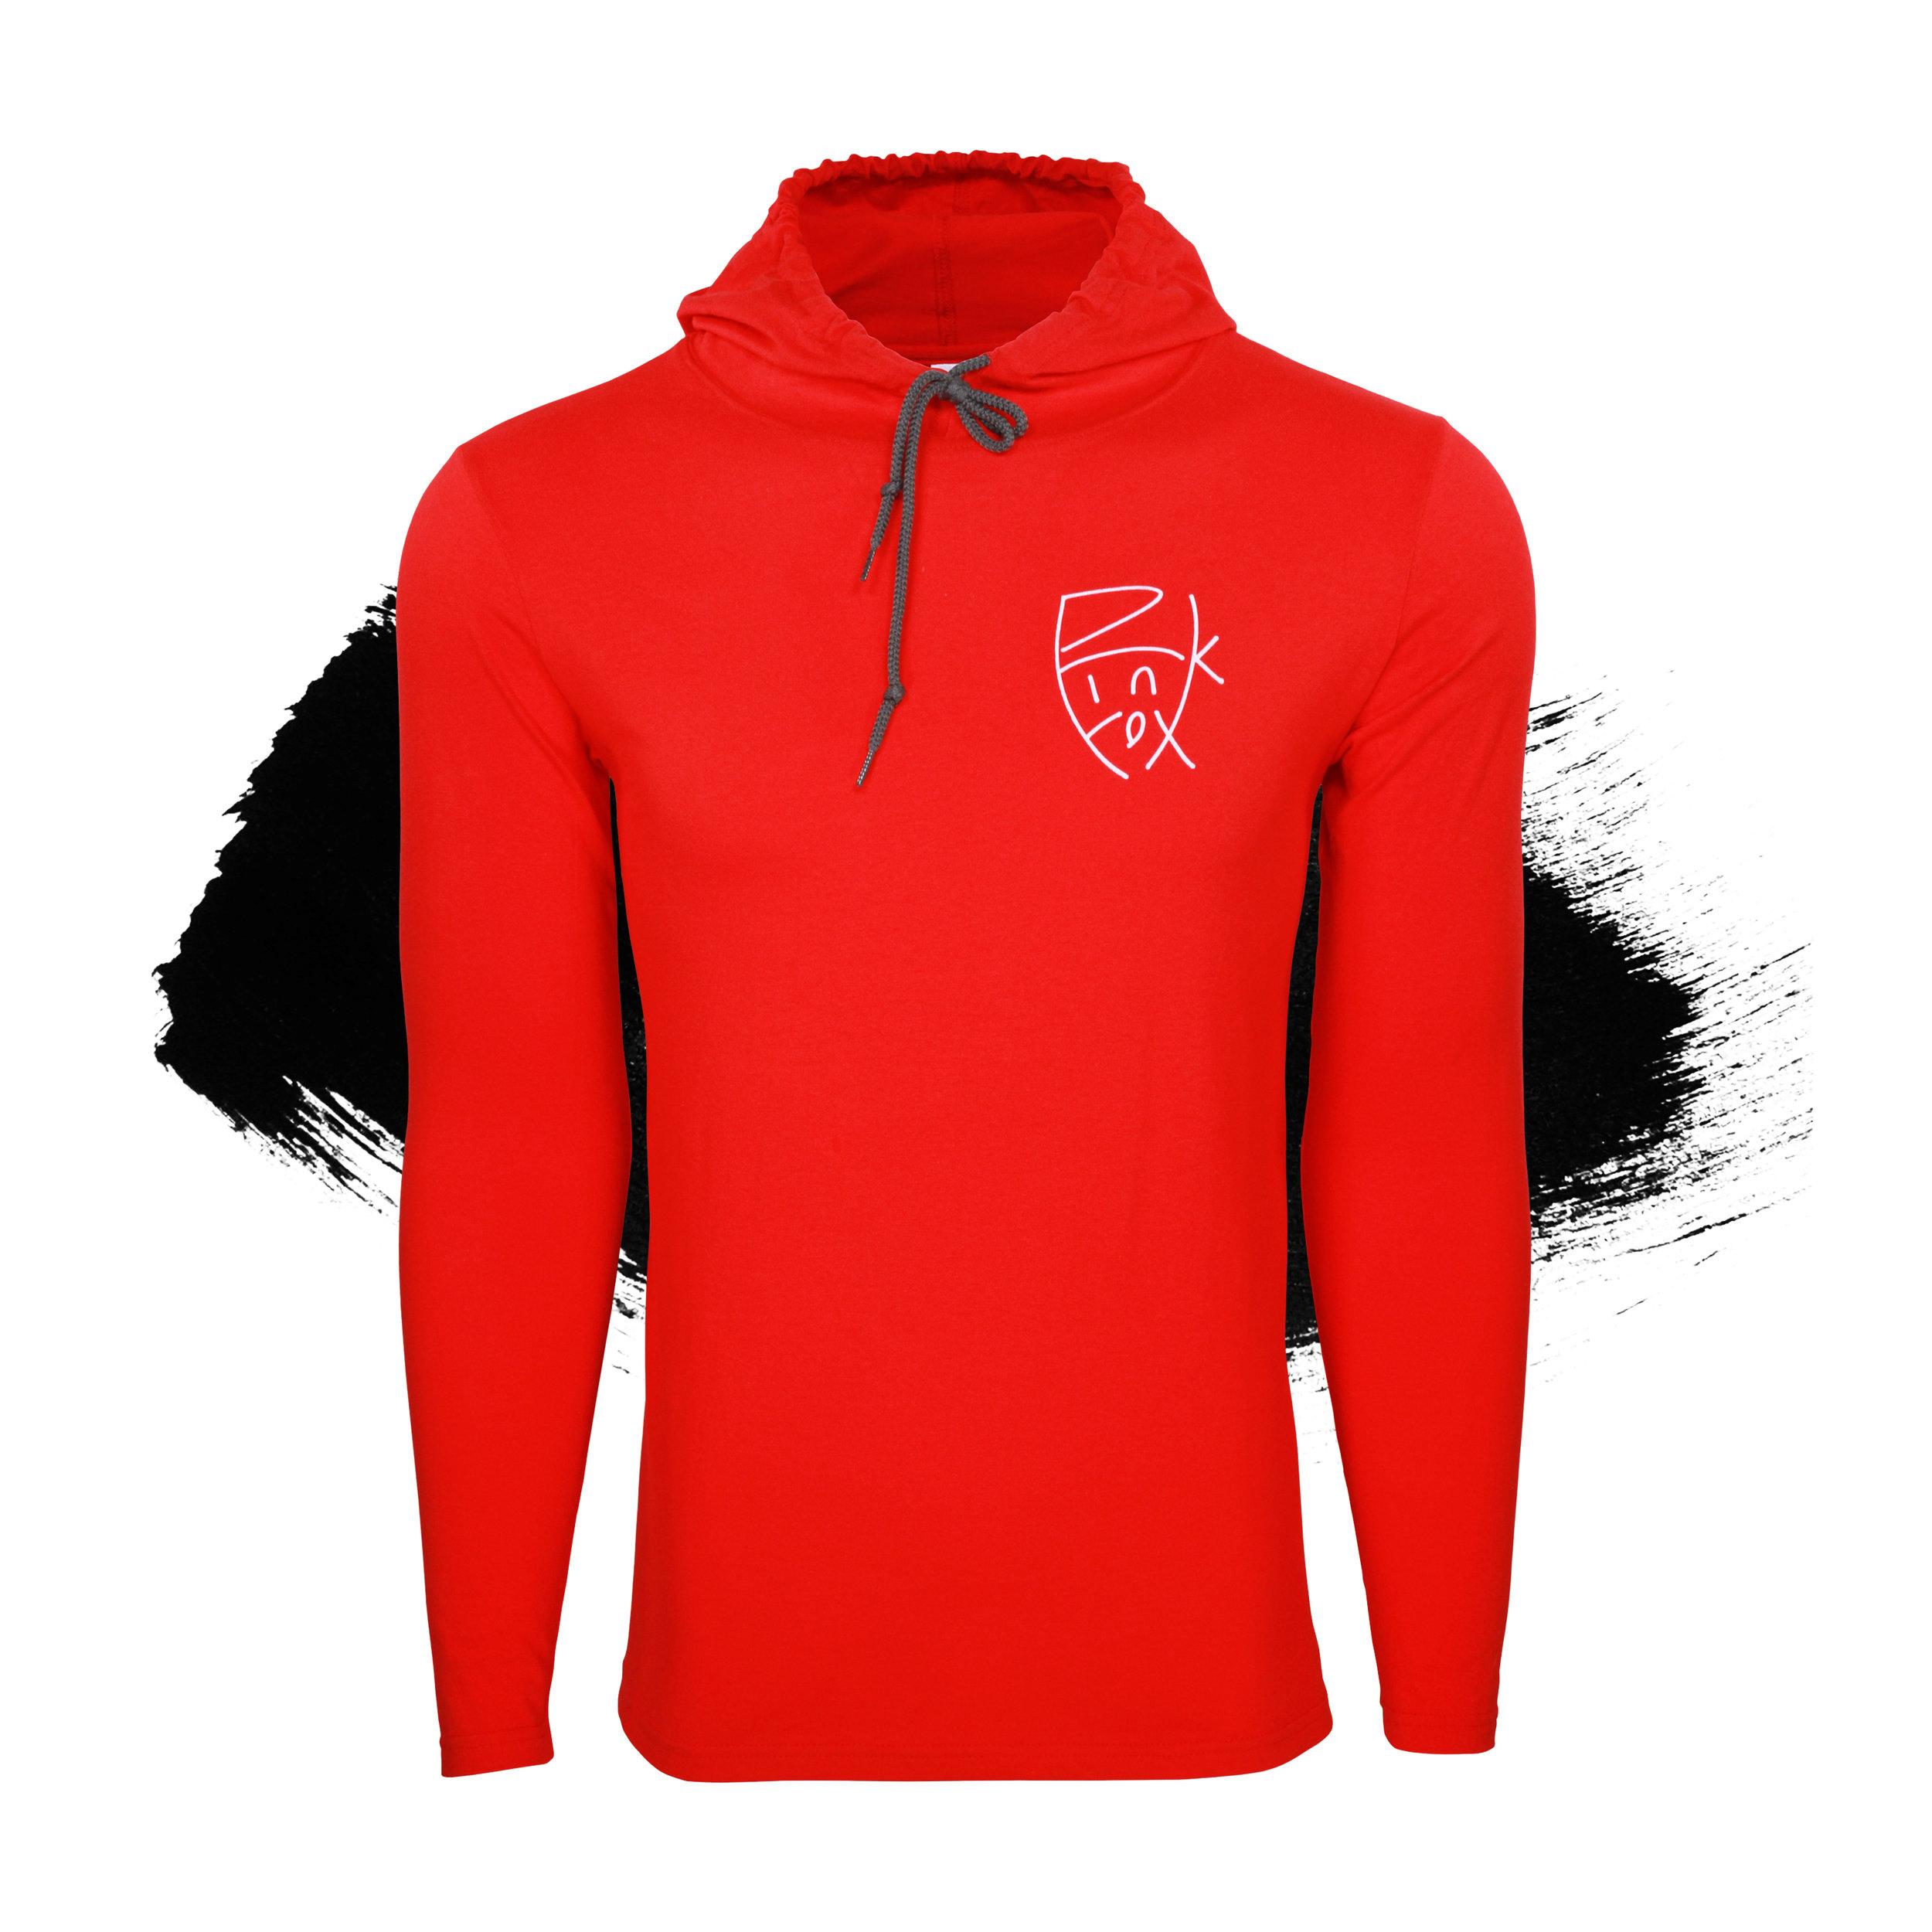 Red long sleeve hooded tee FRONT for IG v9.jpg